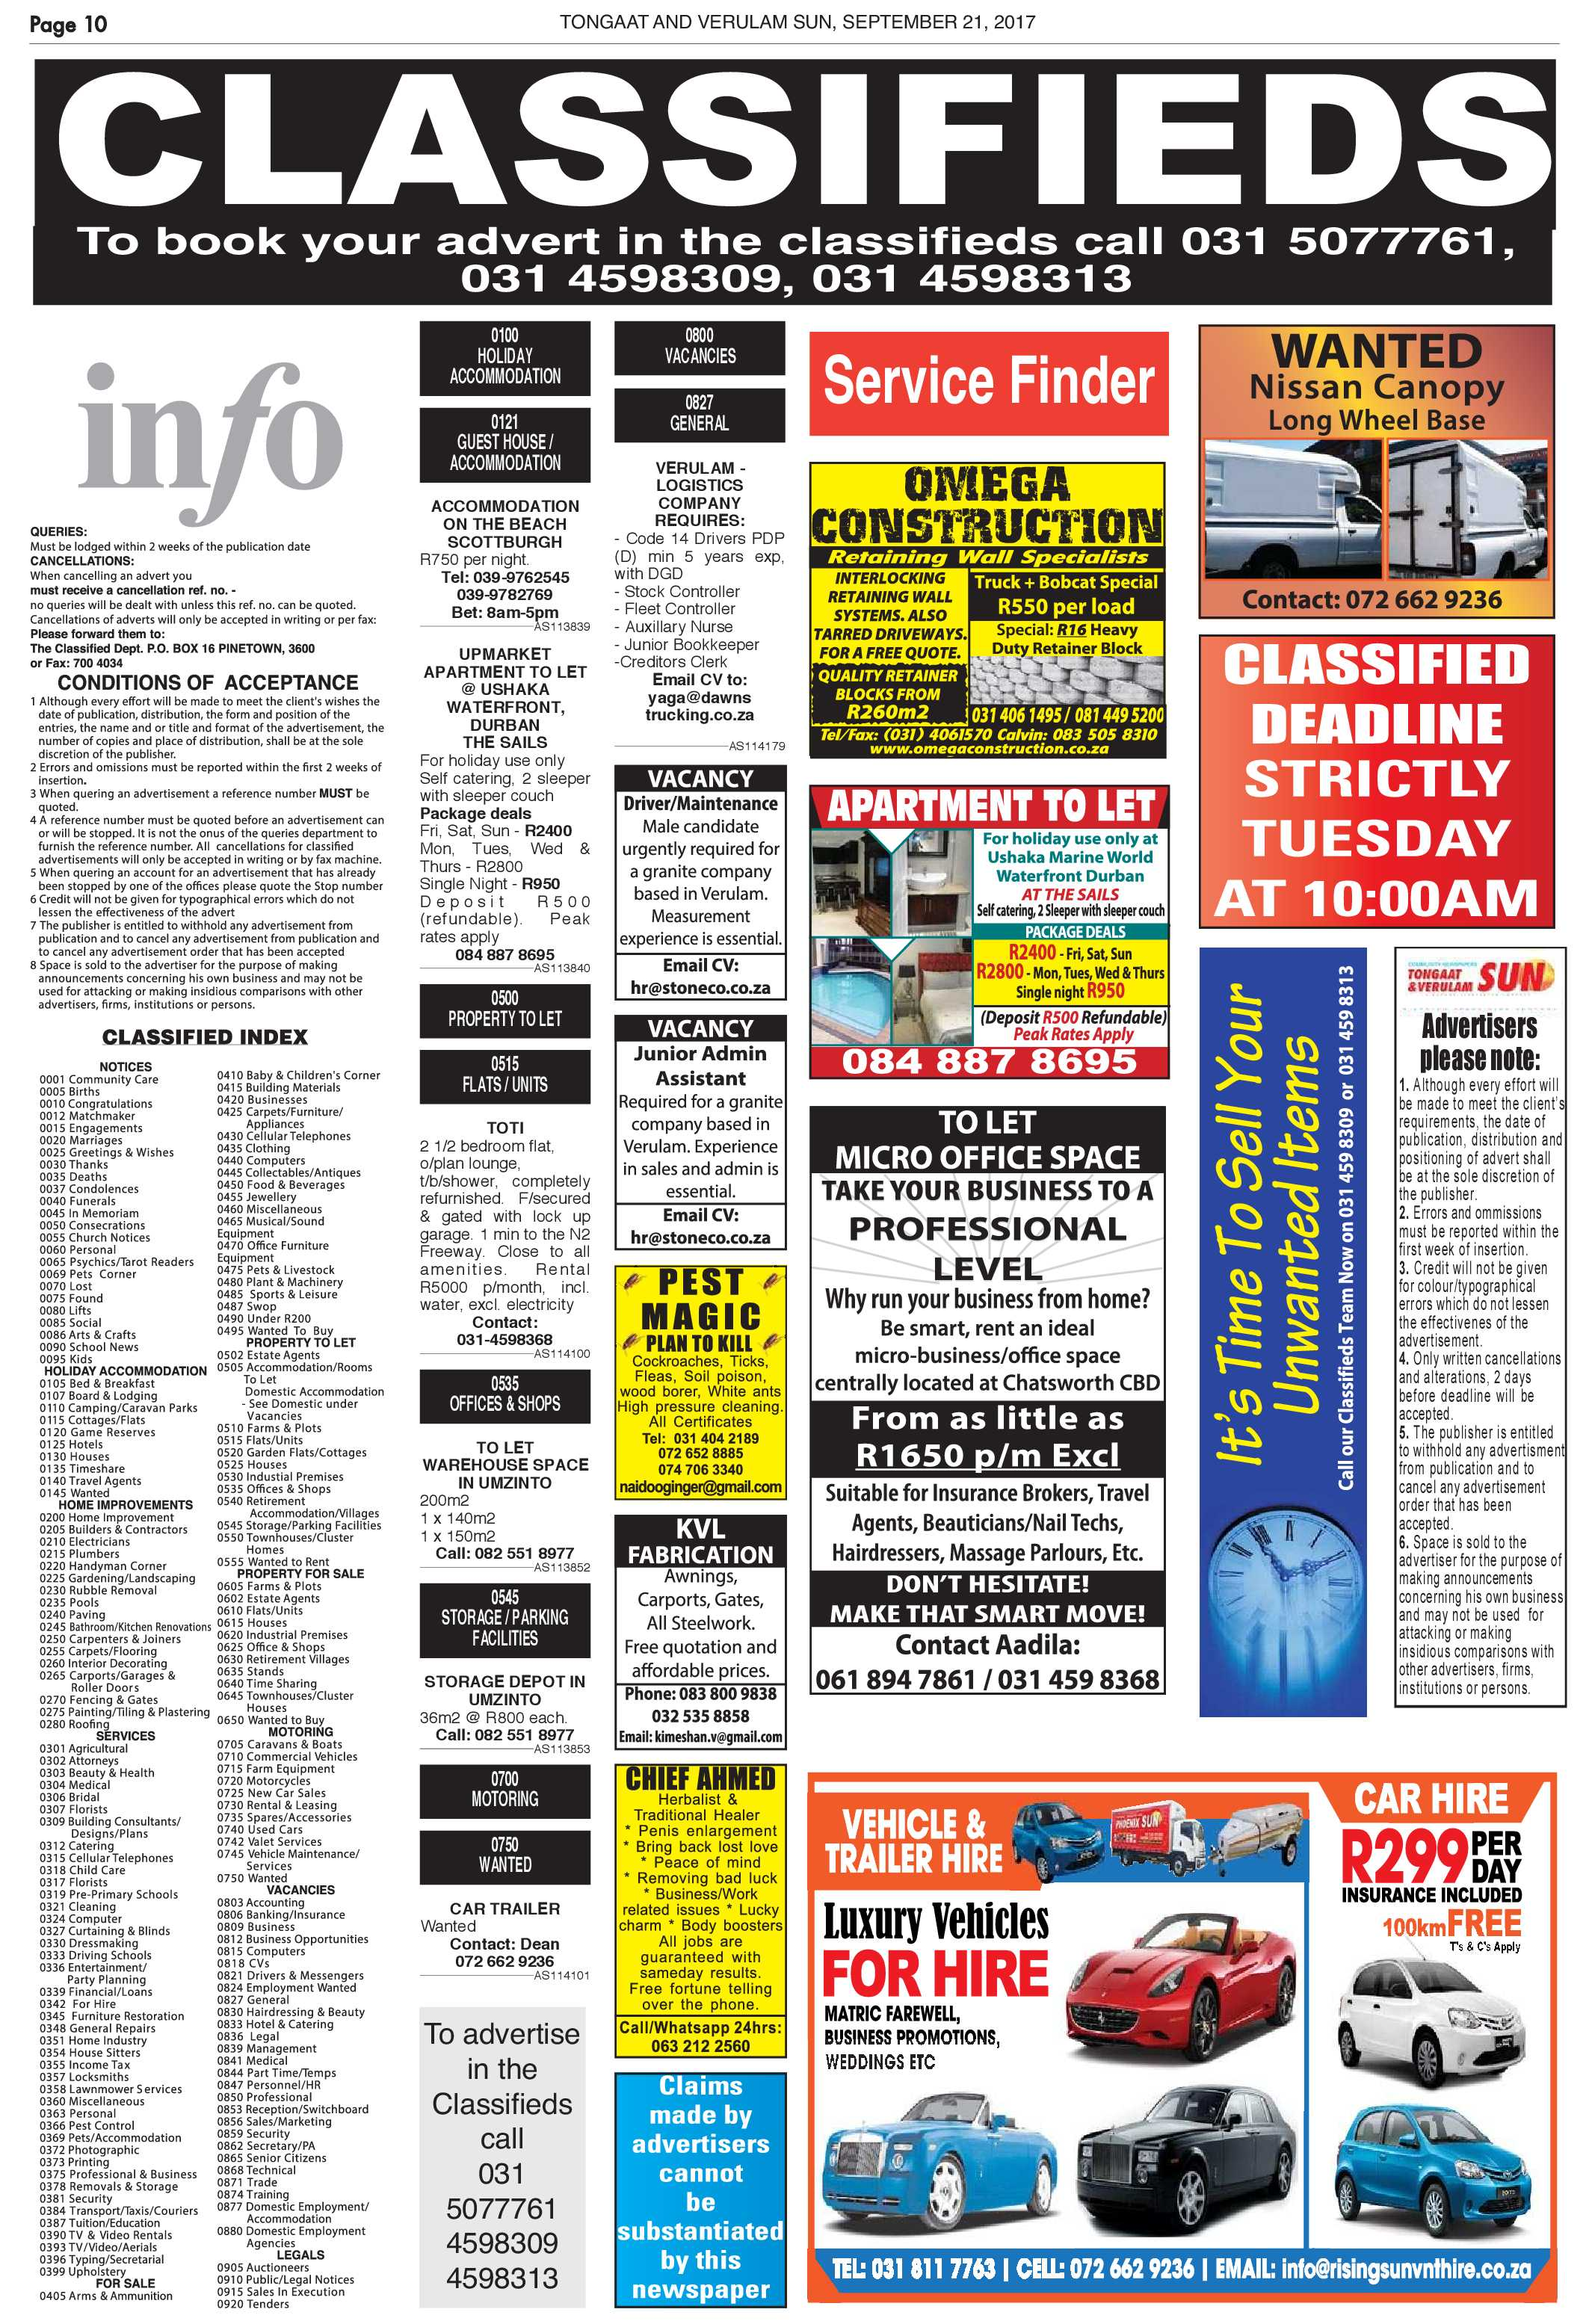 tongaat-verulam-sun-september-21-epapers-page-10